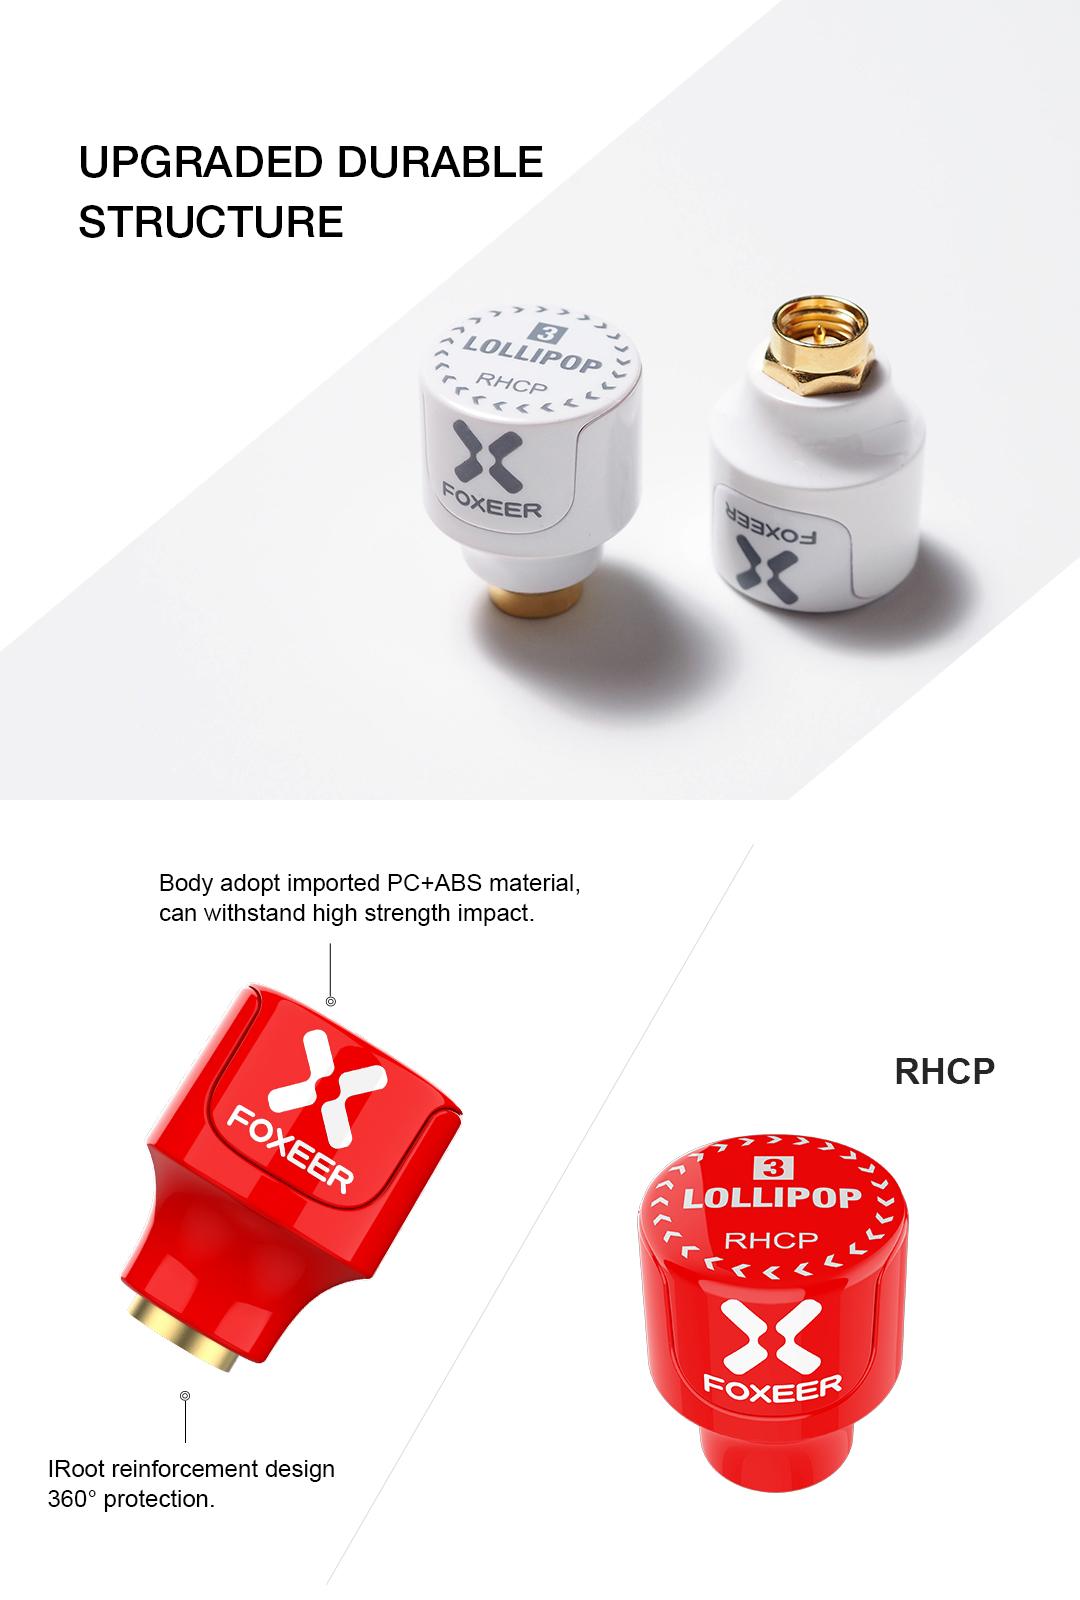 2pcs Foxeer 5.8G Lollipop 3 2.5DBi Stubby Omni FPV Antenna LHCP/RHCP for RC Drone - Photo: 2